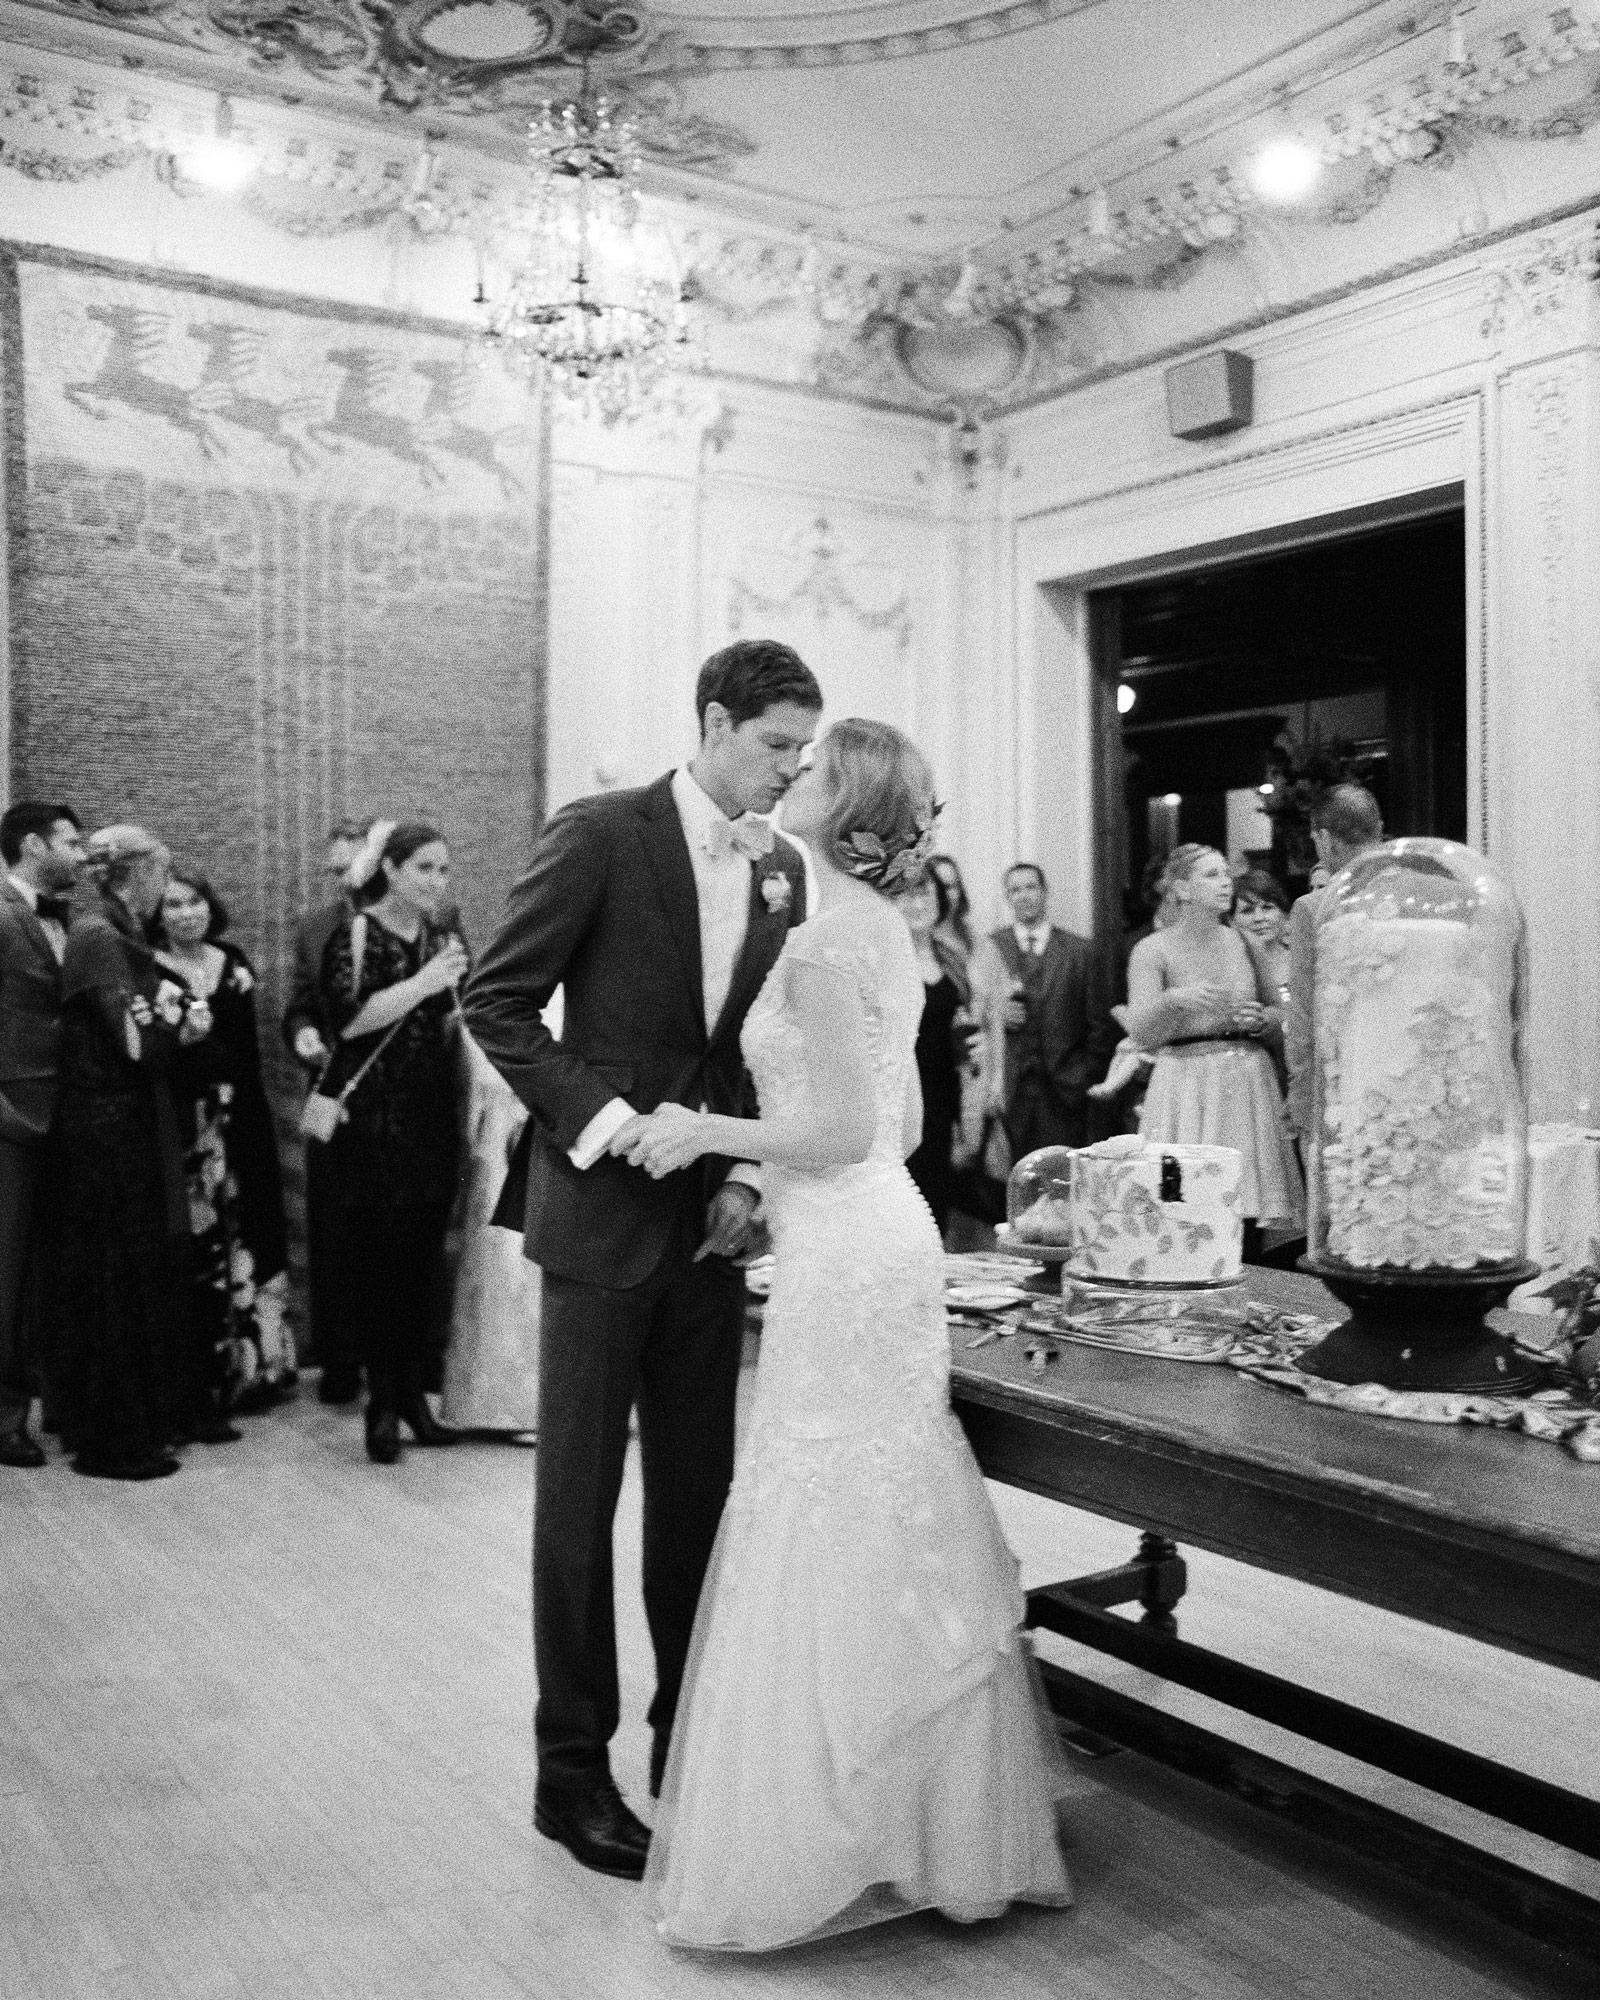 adrienne-jason-wedding-minnesota-cakecutting-0486-s111925.jpg